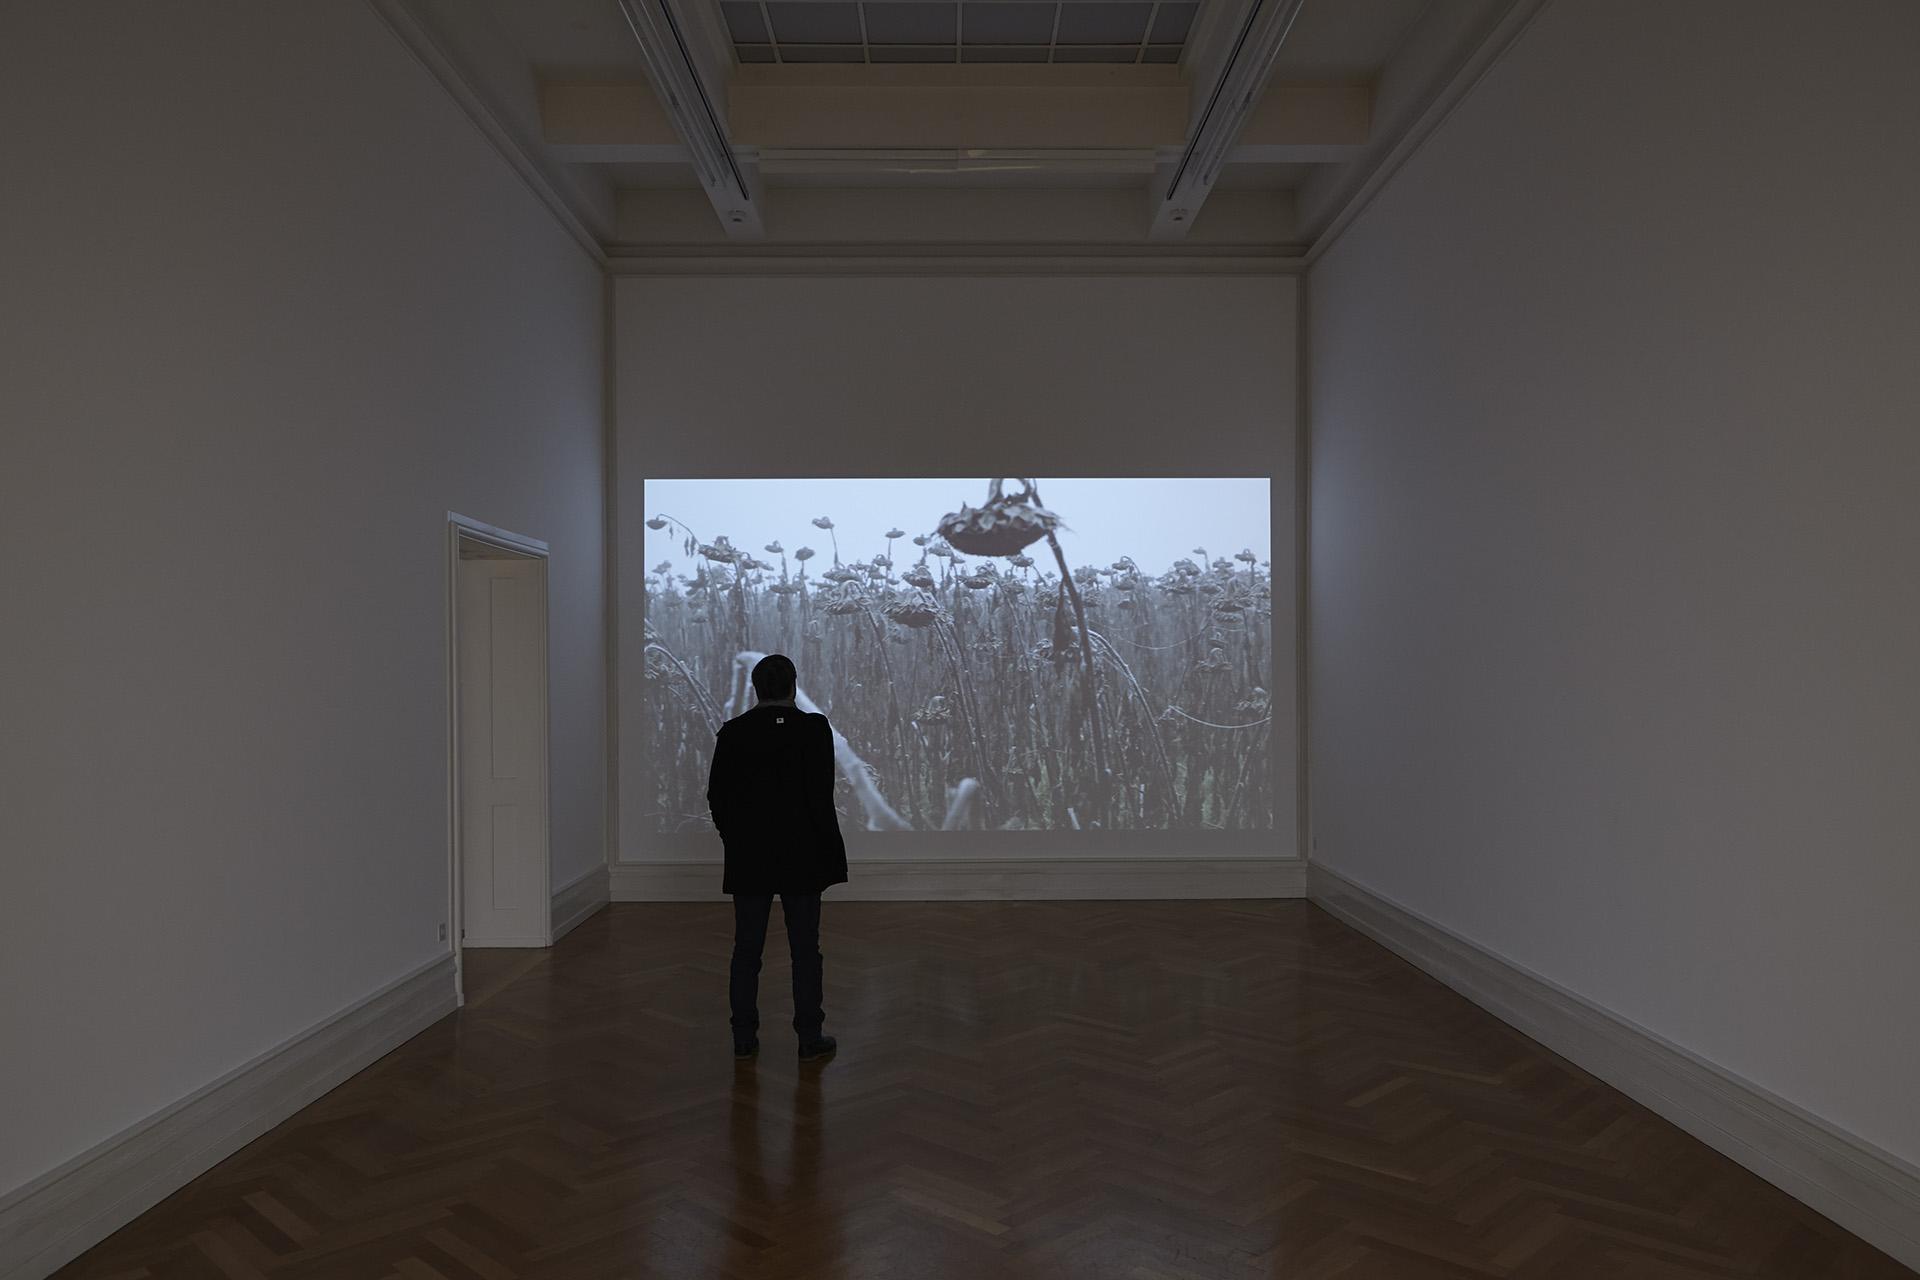 Video Sonnenblumen | Kunsthalle Bern | Cantonale Berne Jura | 2014